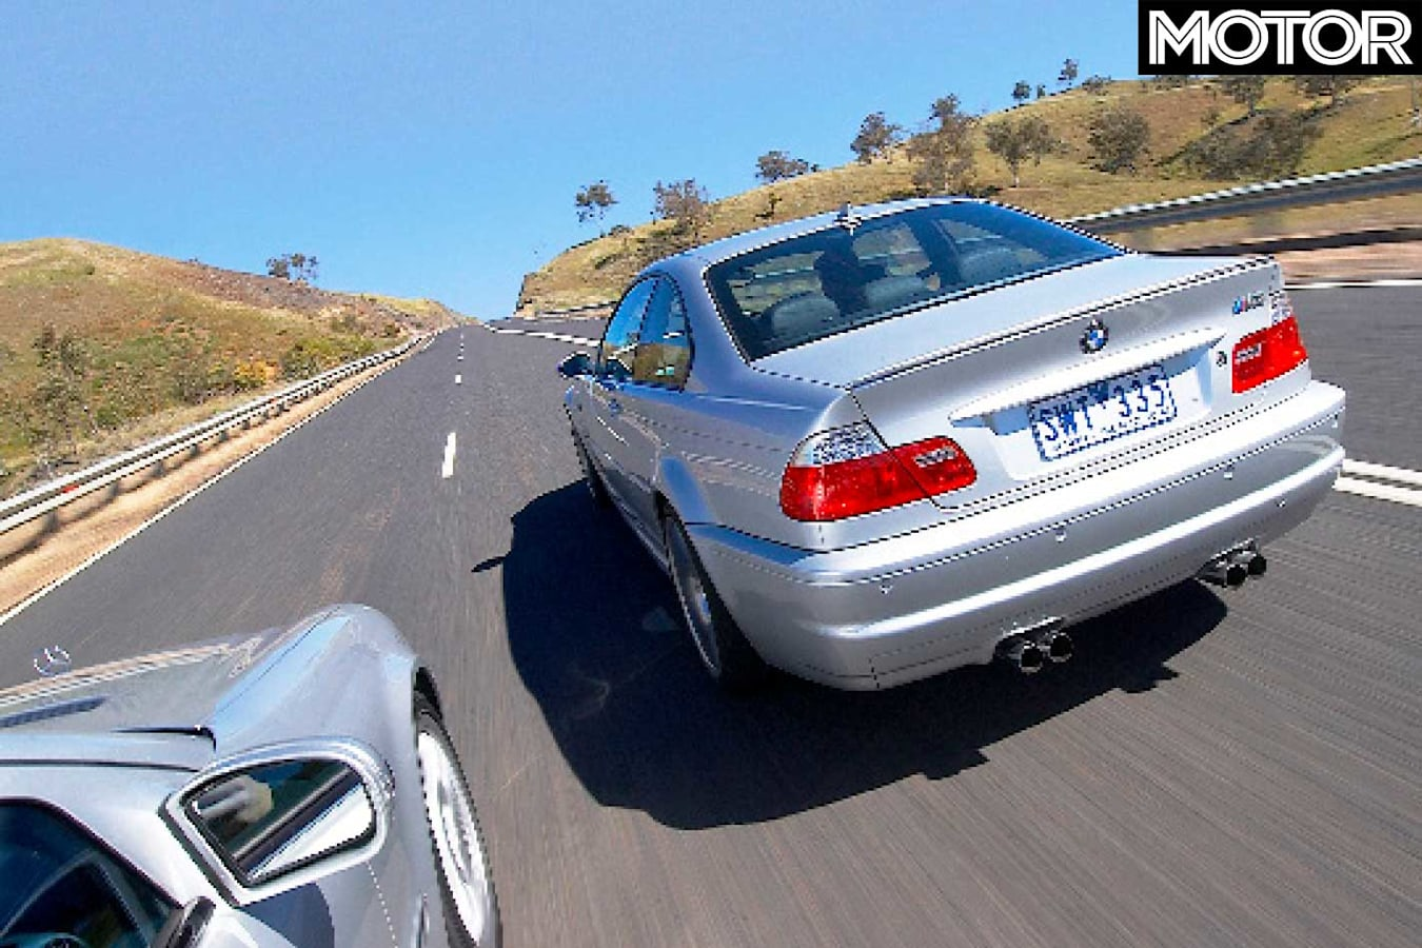 2005 BMW M 3 Vs Mercedes Benz C 55 AMG Comparison Performance Jpg